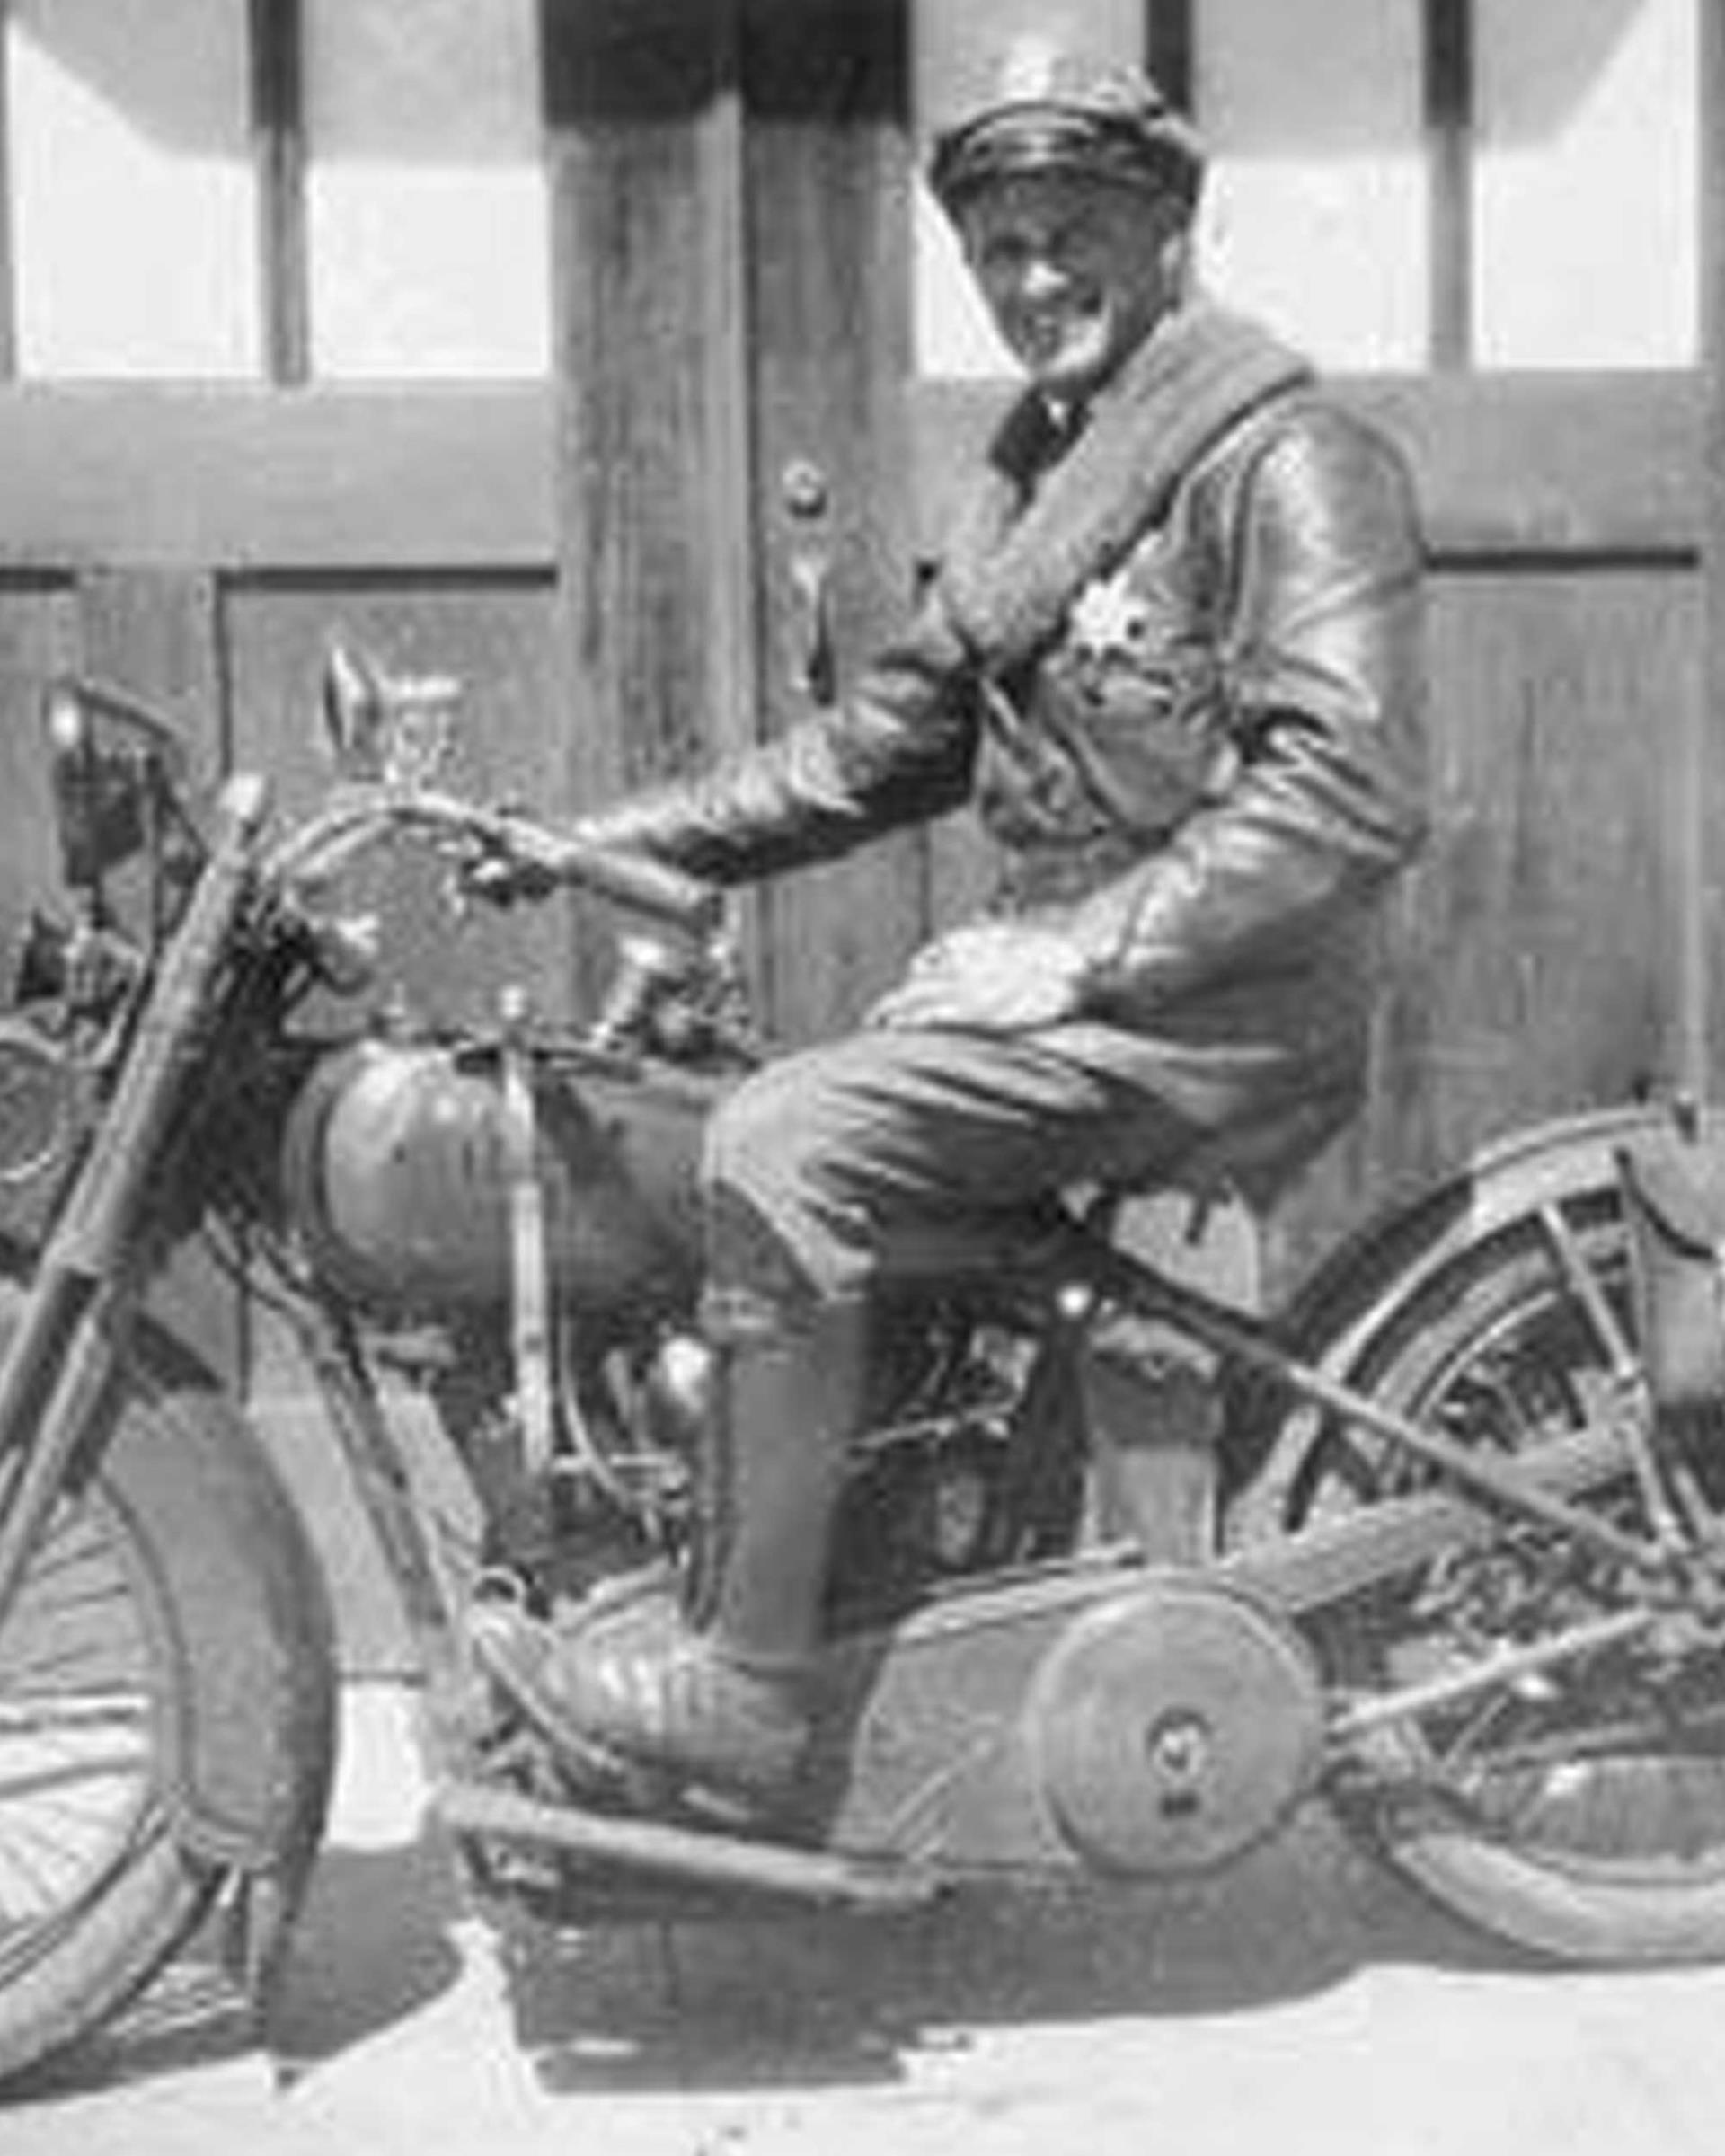 Chief Manuel Menotti (1930-1937)